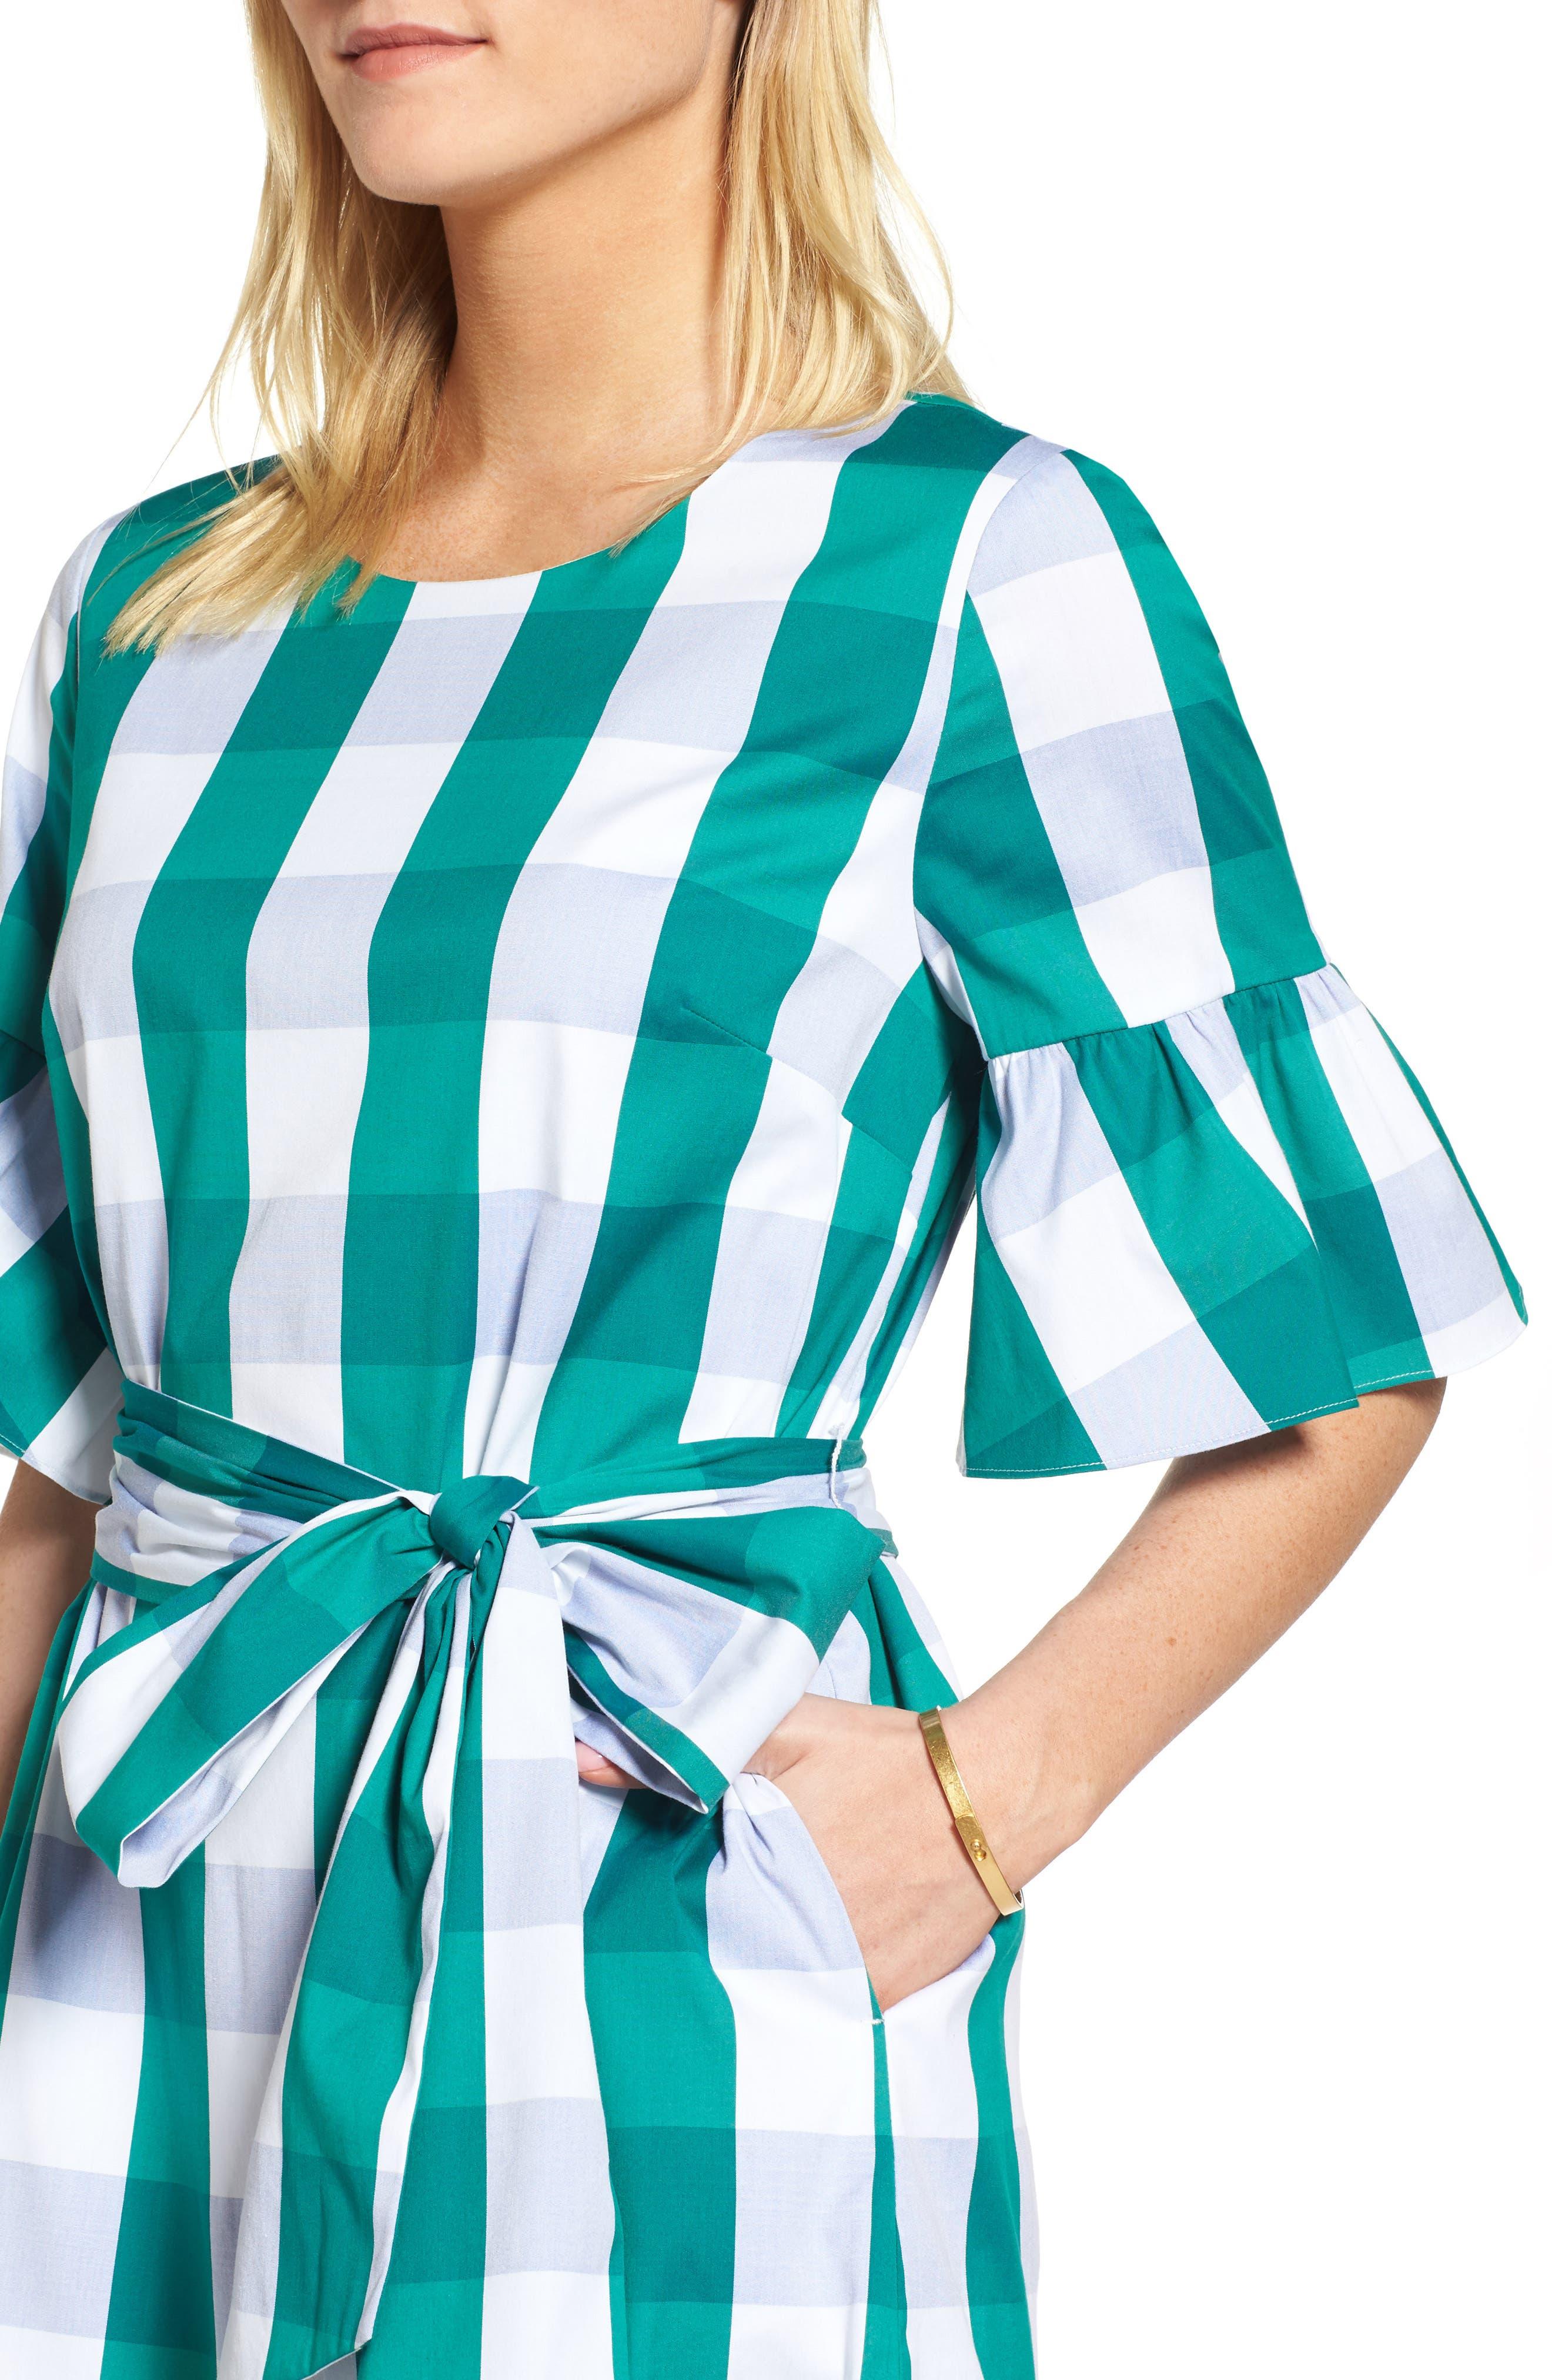 Ruffle & Bow Dress,                             Alternate thumbnail 5, color,                             Green- Blue Gingham